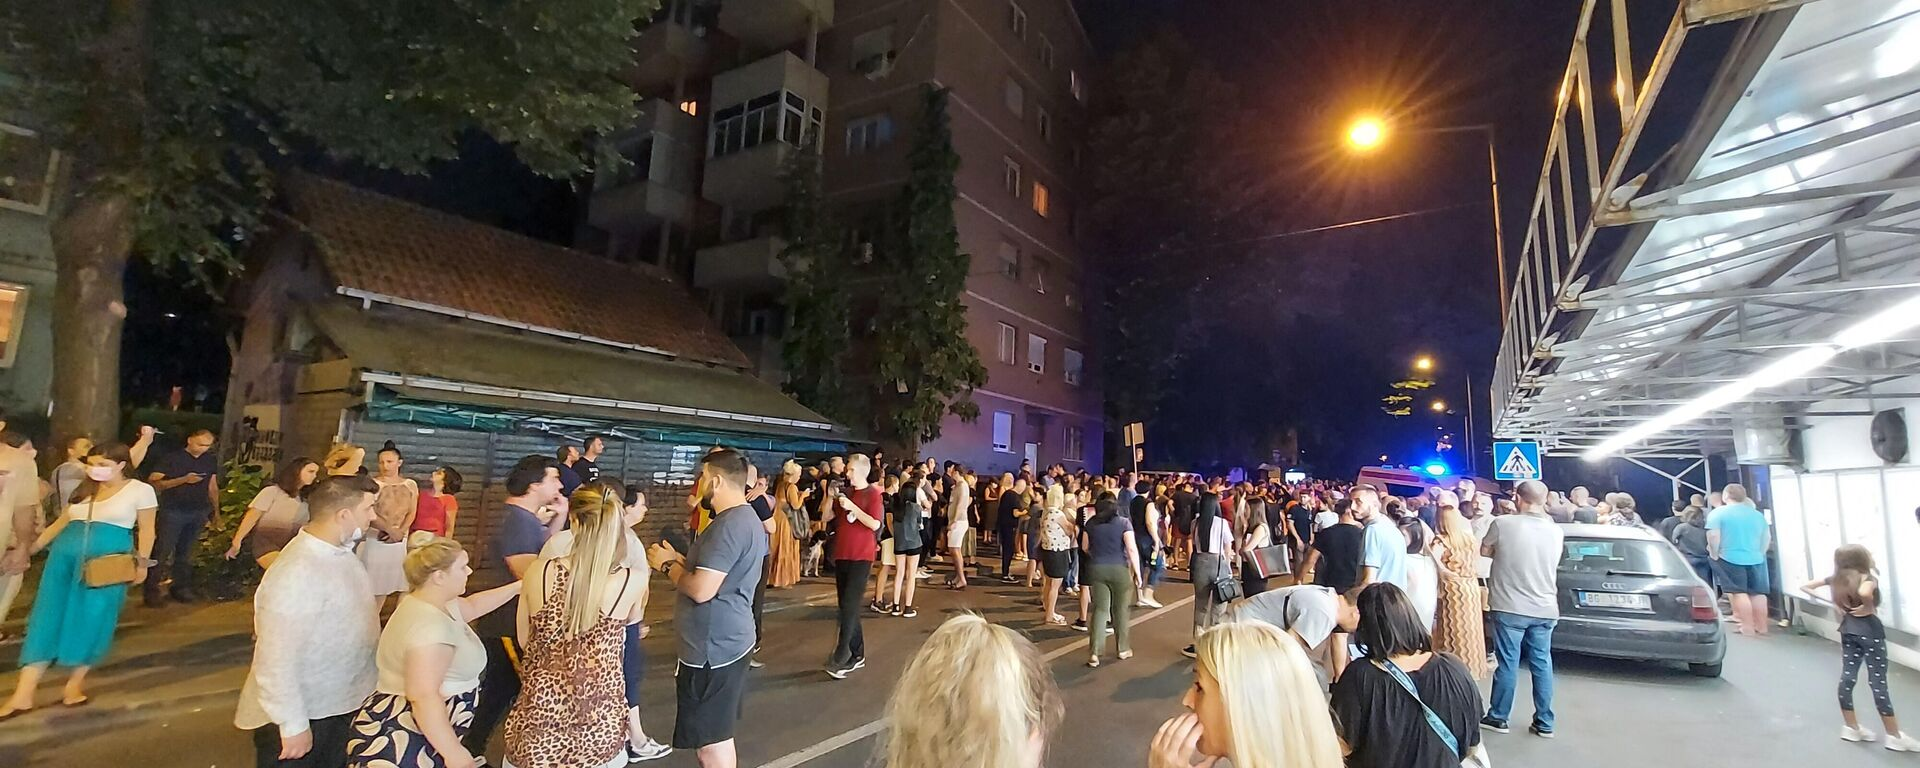 Protest na Karaburmi zbog pogibije dečaka - Sputnik Srbija, 1920, 23.07.2021